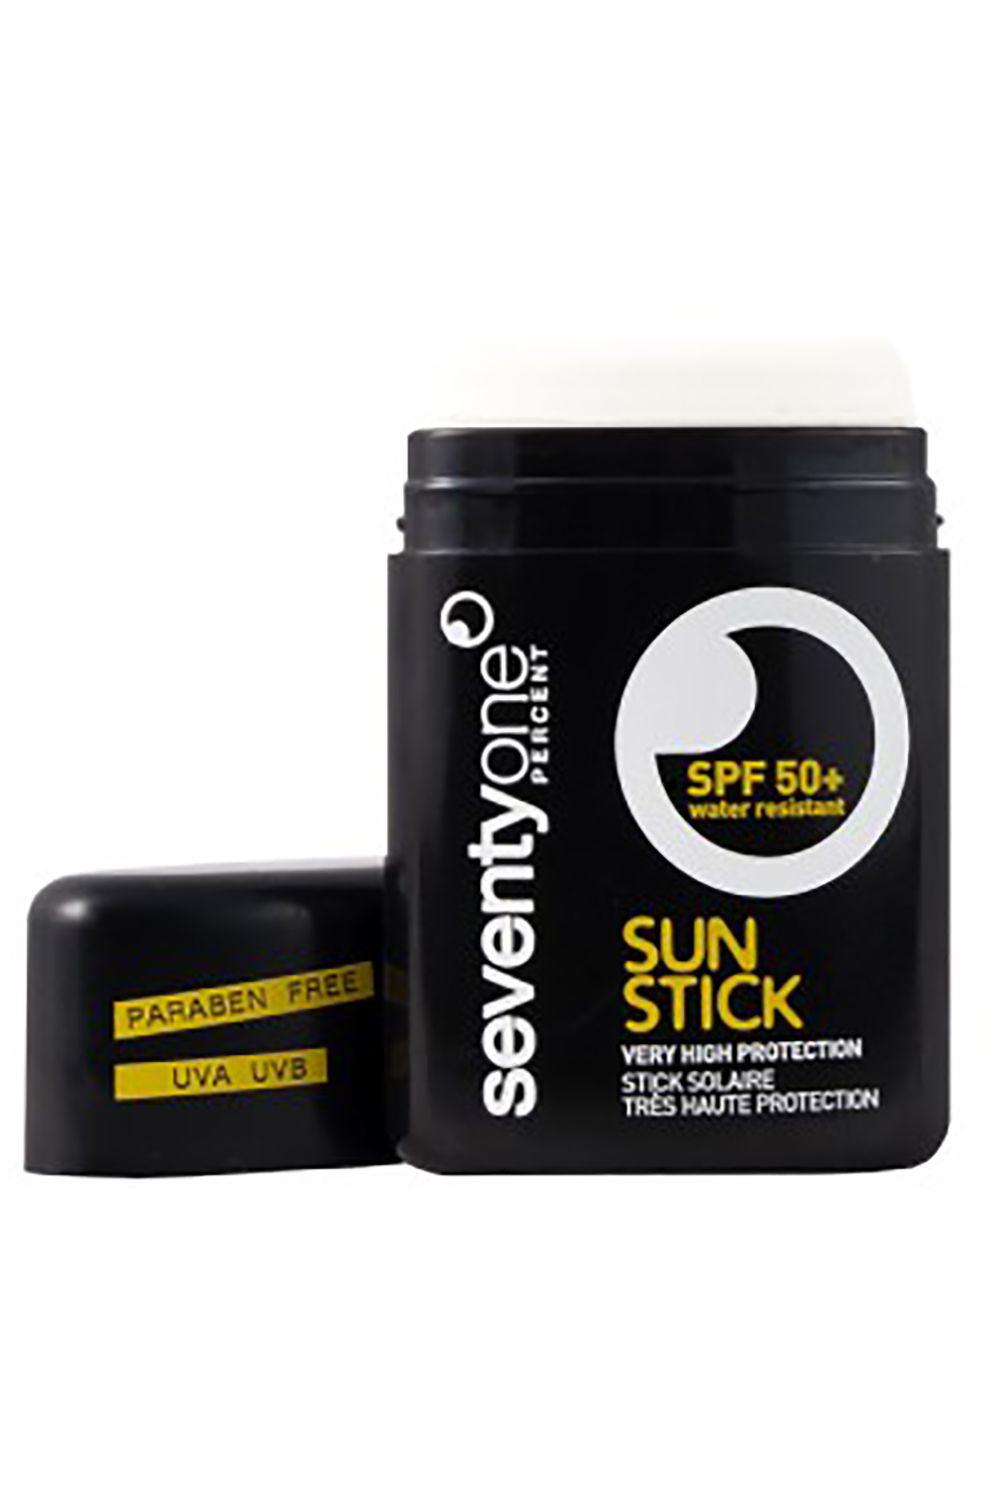 Seventy One Percent Sunscreen SUN STICK ? ORIGINAL - SPF50+ White